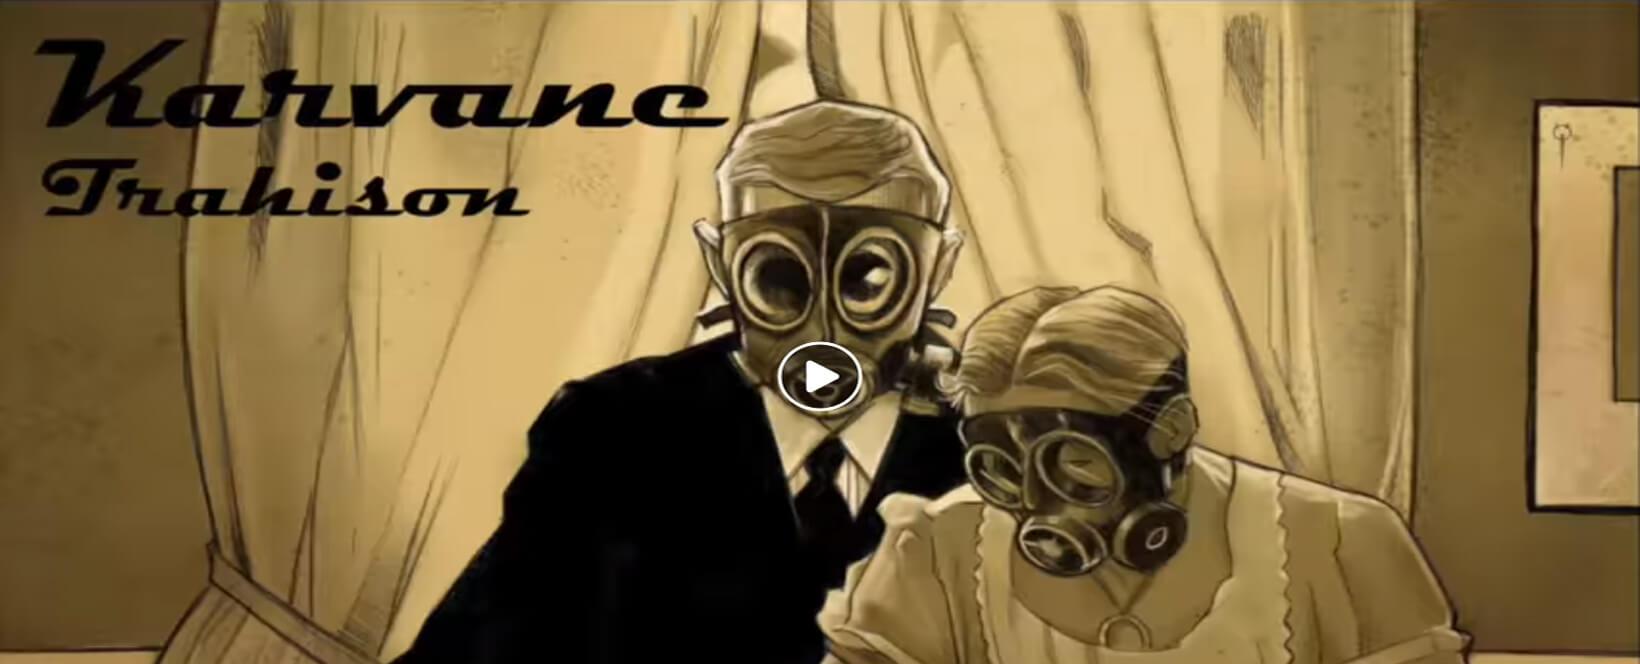 BC-357-Album - Karavane : Trahison - Radio Galaxie 98.5FM